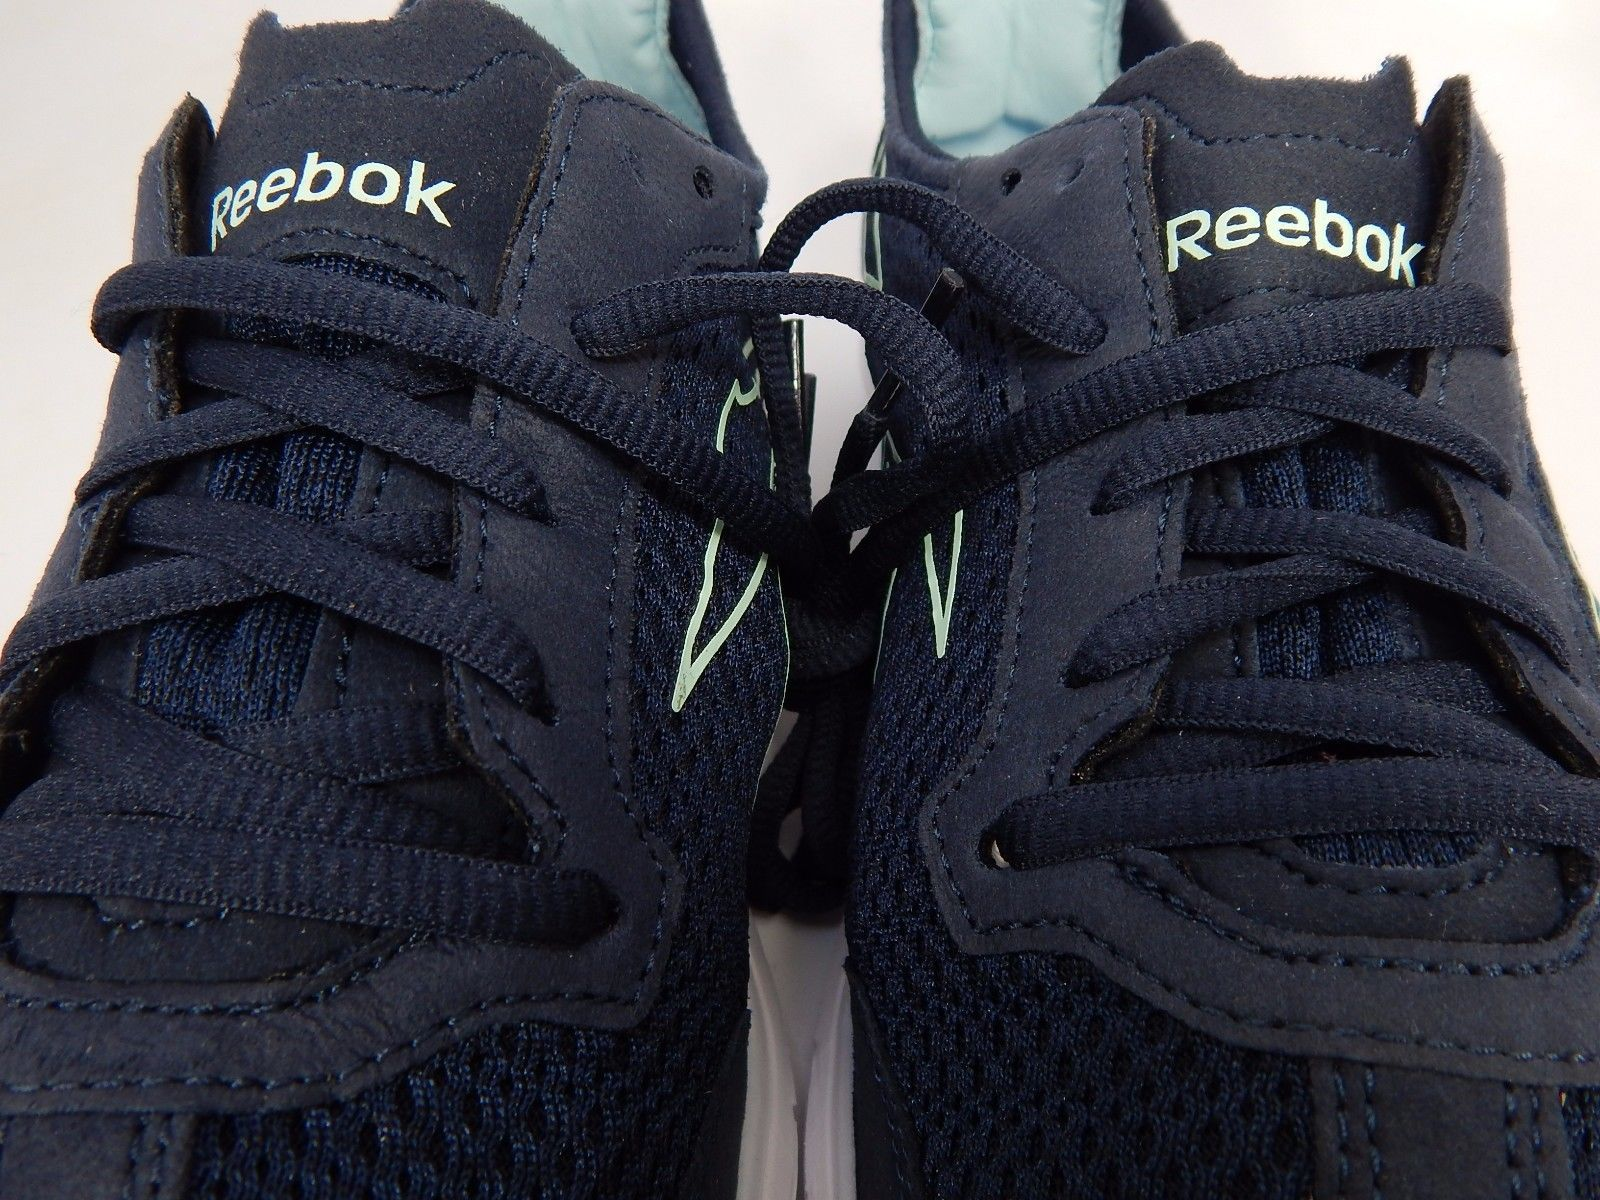 Reebok Sport Ahead Action RS Women's Running Shoes Size US 8 M (B) EU 38.5 Blue